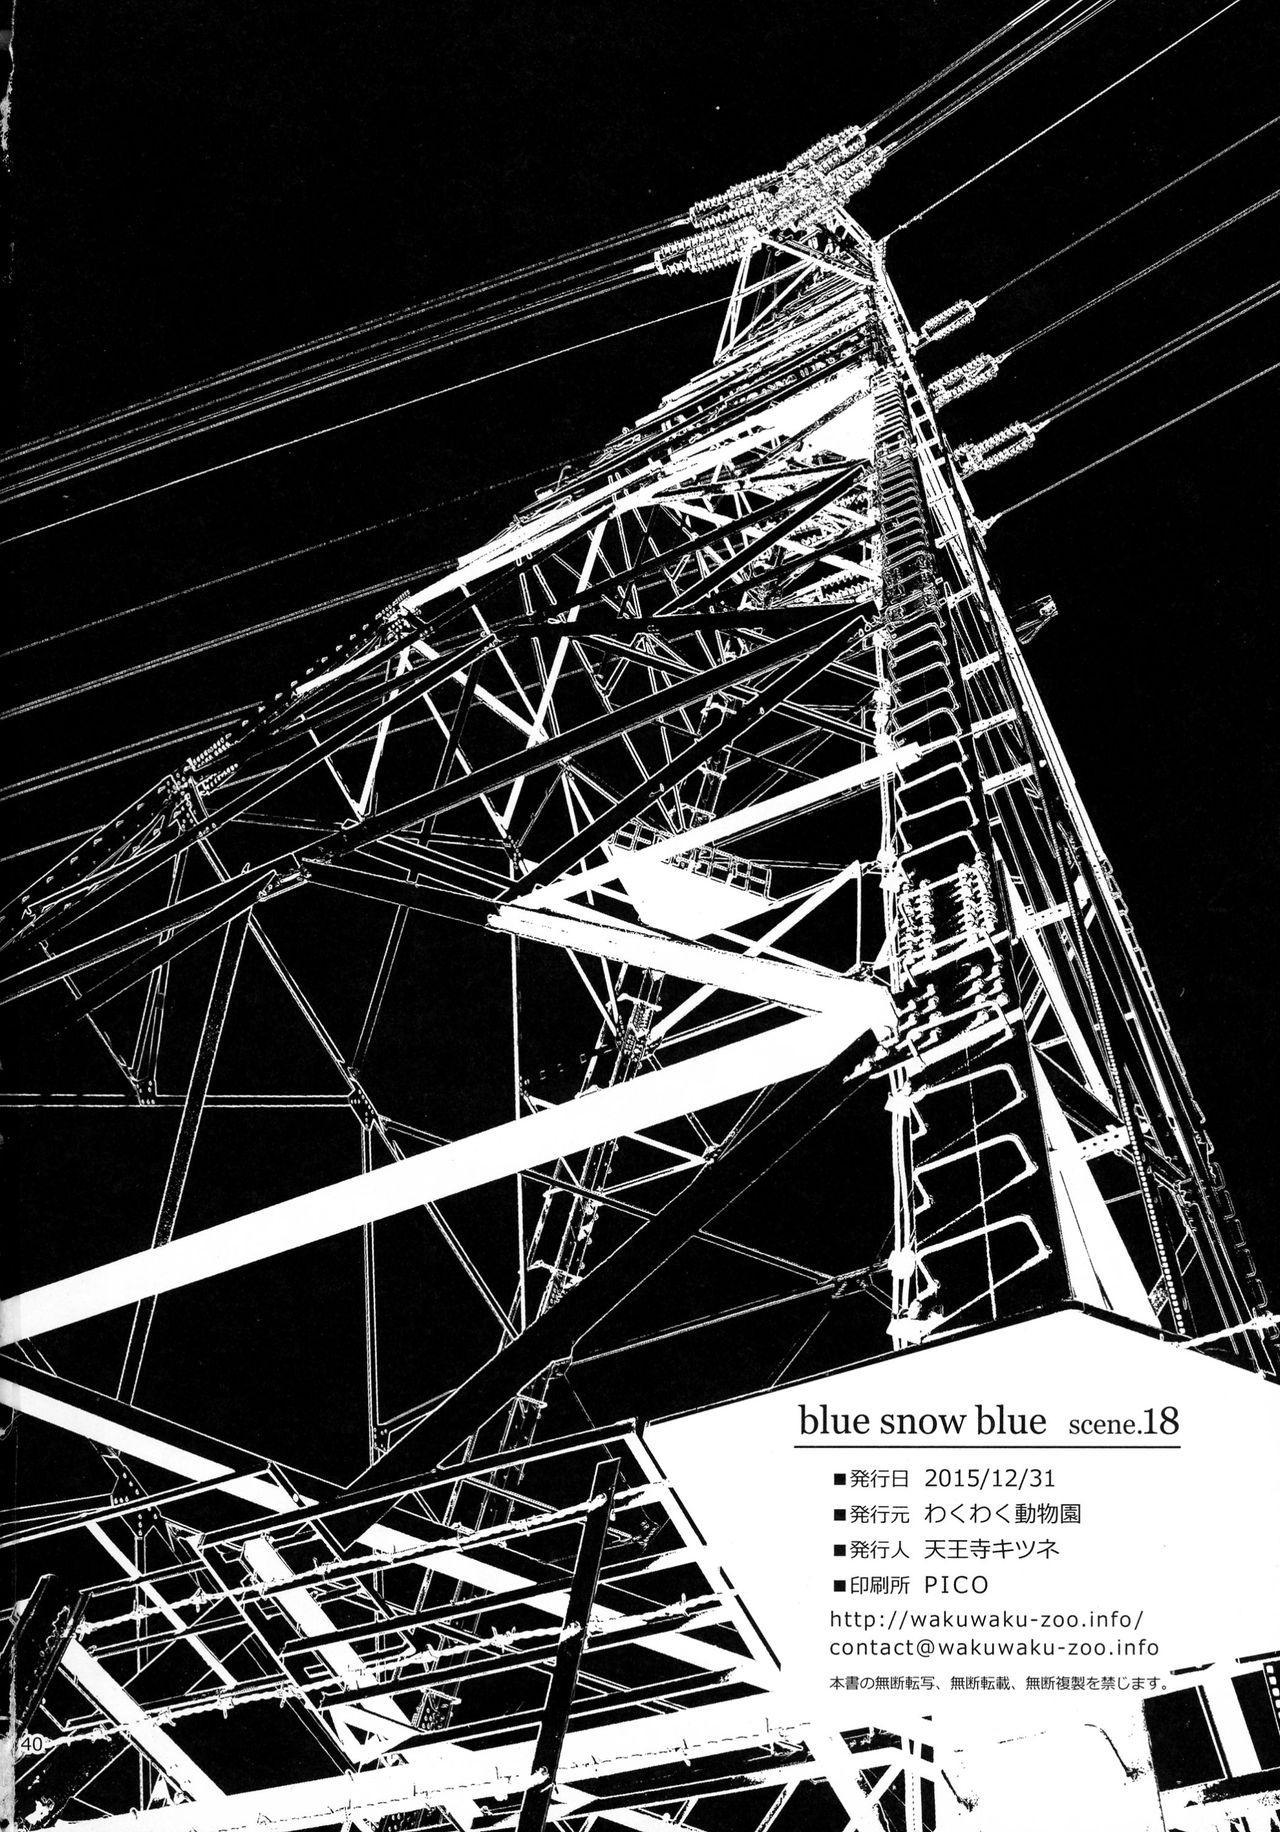 blue snow blue scene.18 39